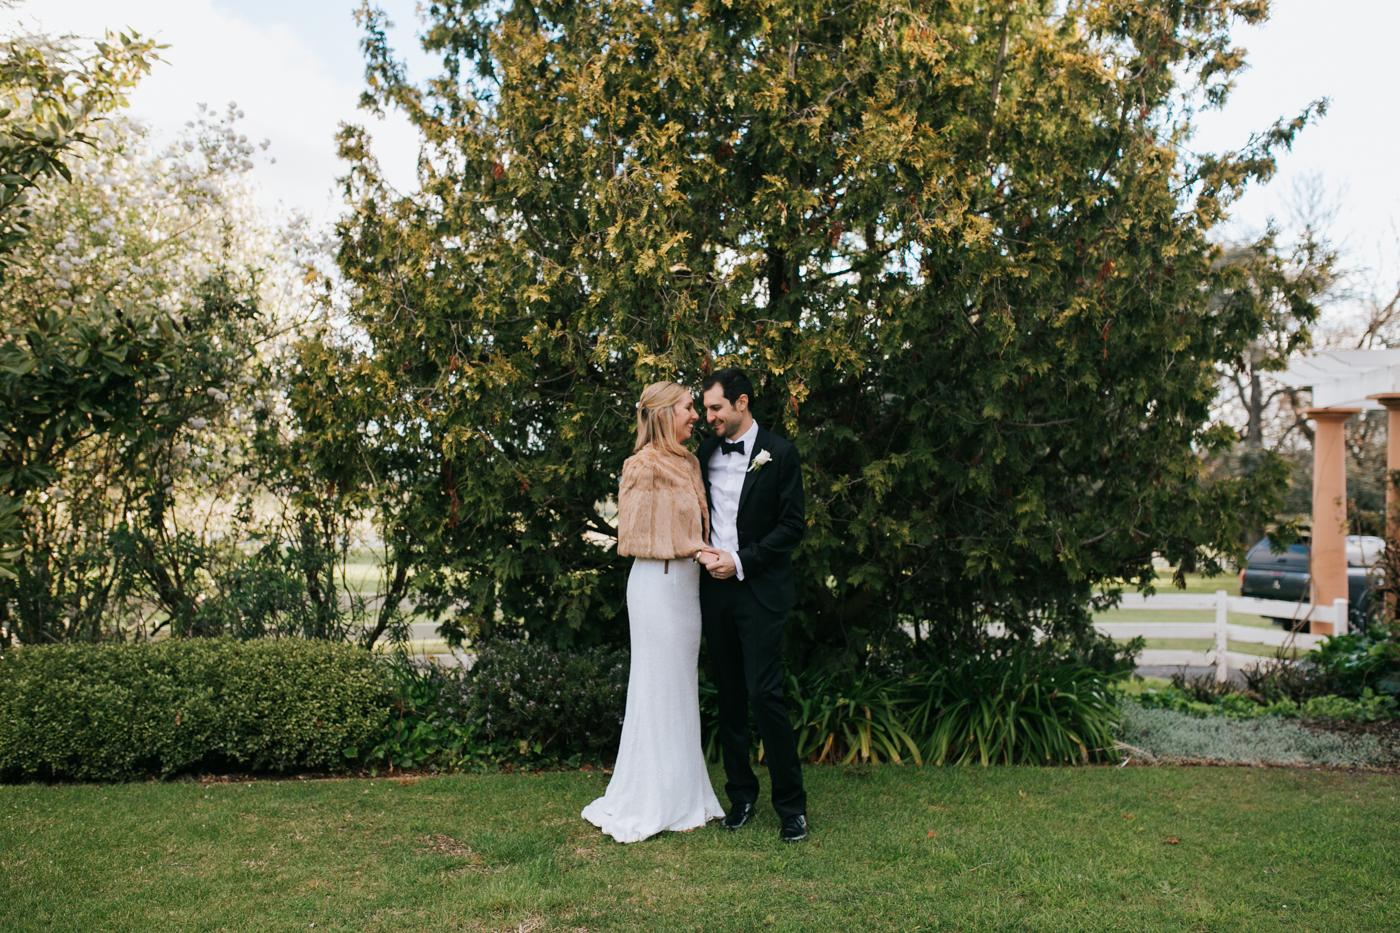 Bridget & James - Orange Country Wedding - Samantha Heather Photography-164.jpg